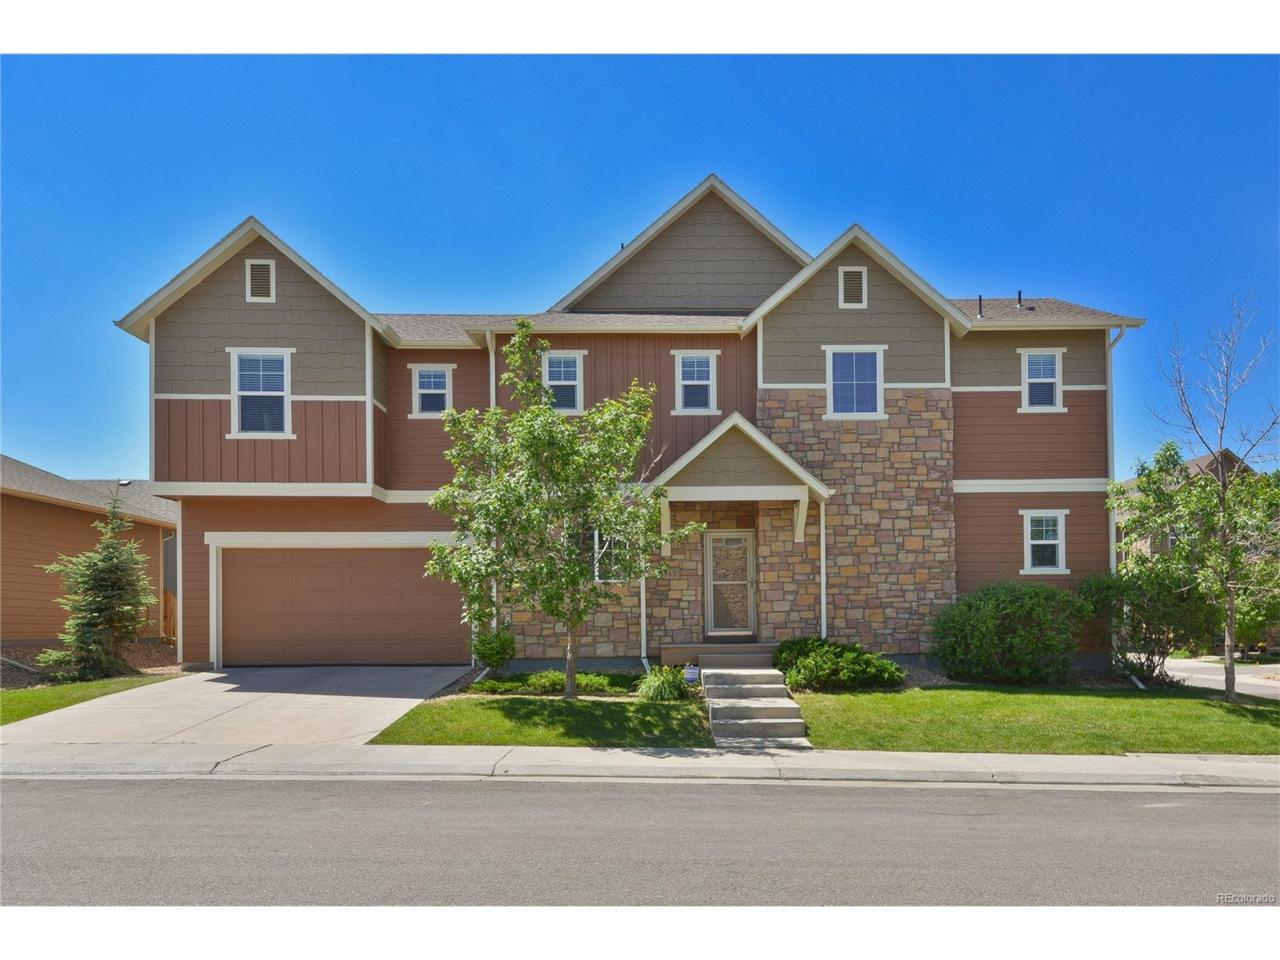 1942 Windemere Lane, Erie, CO 80516 (MLS #6442053) :: 8z Real Estate